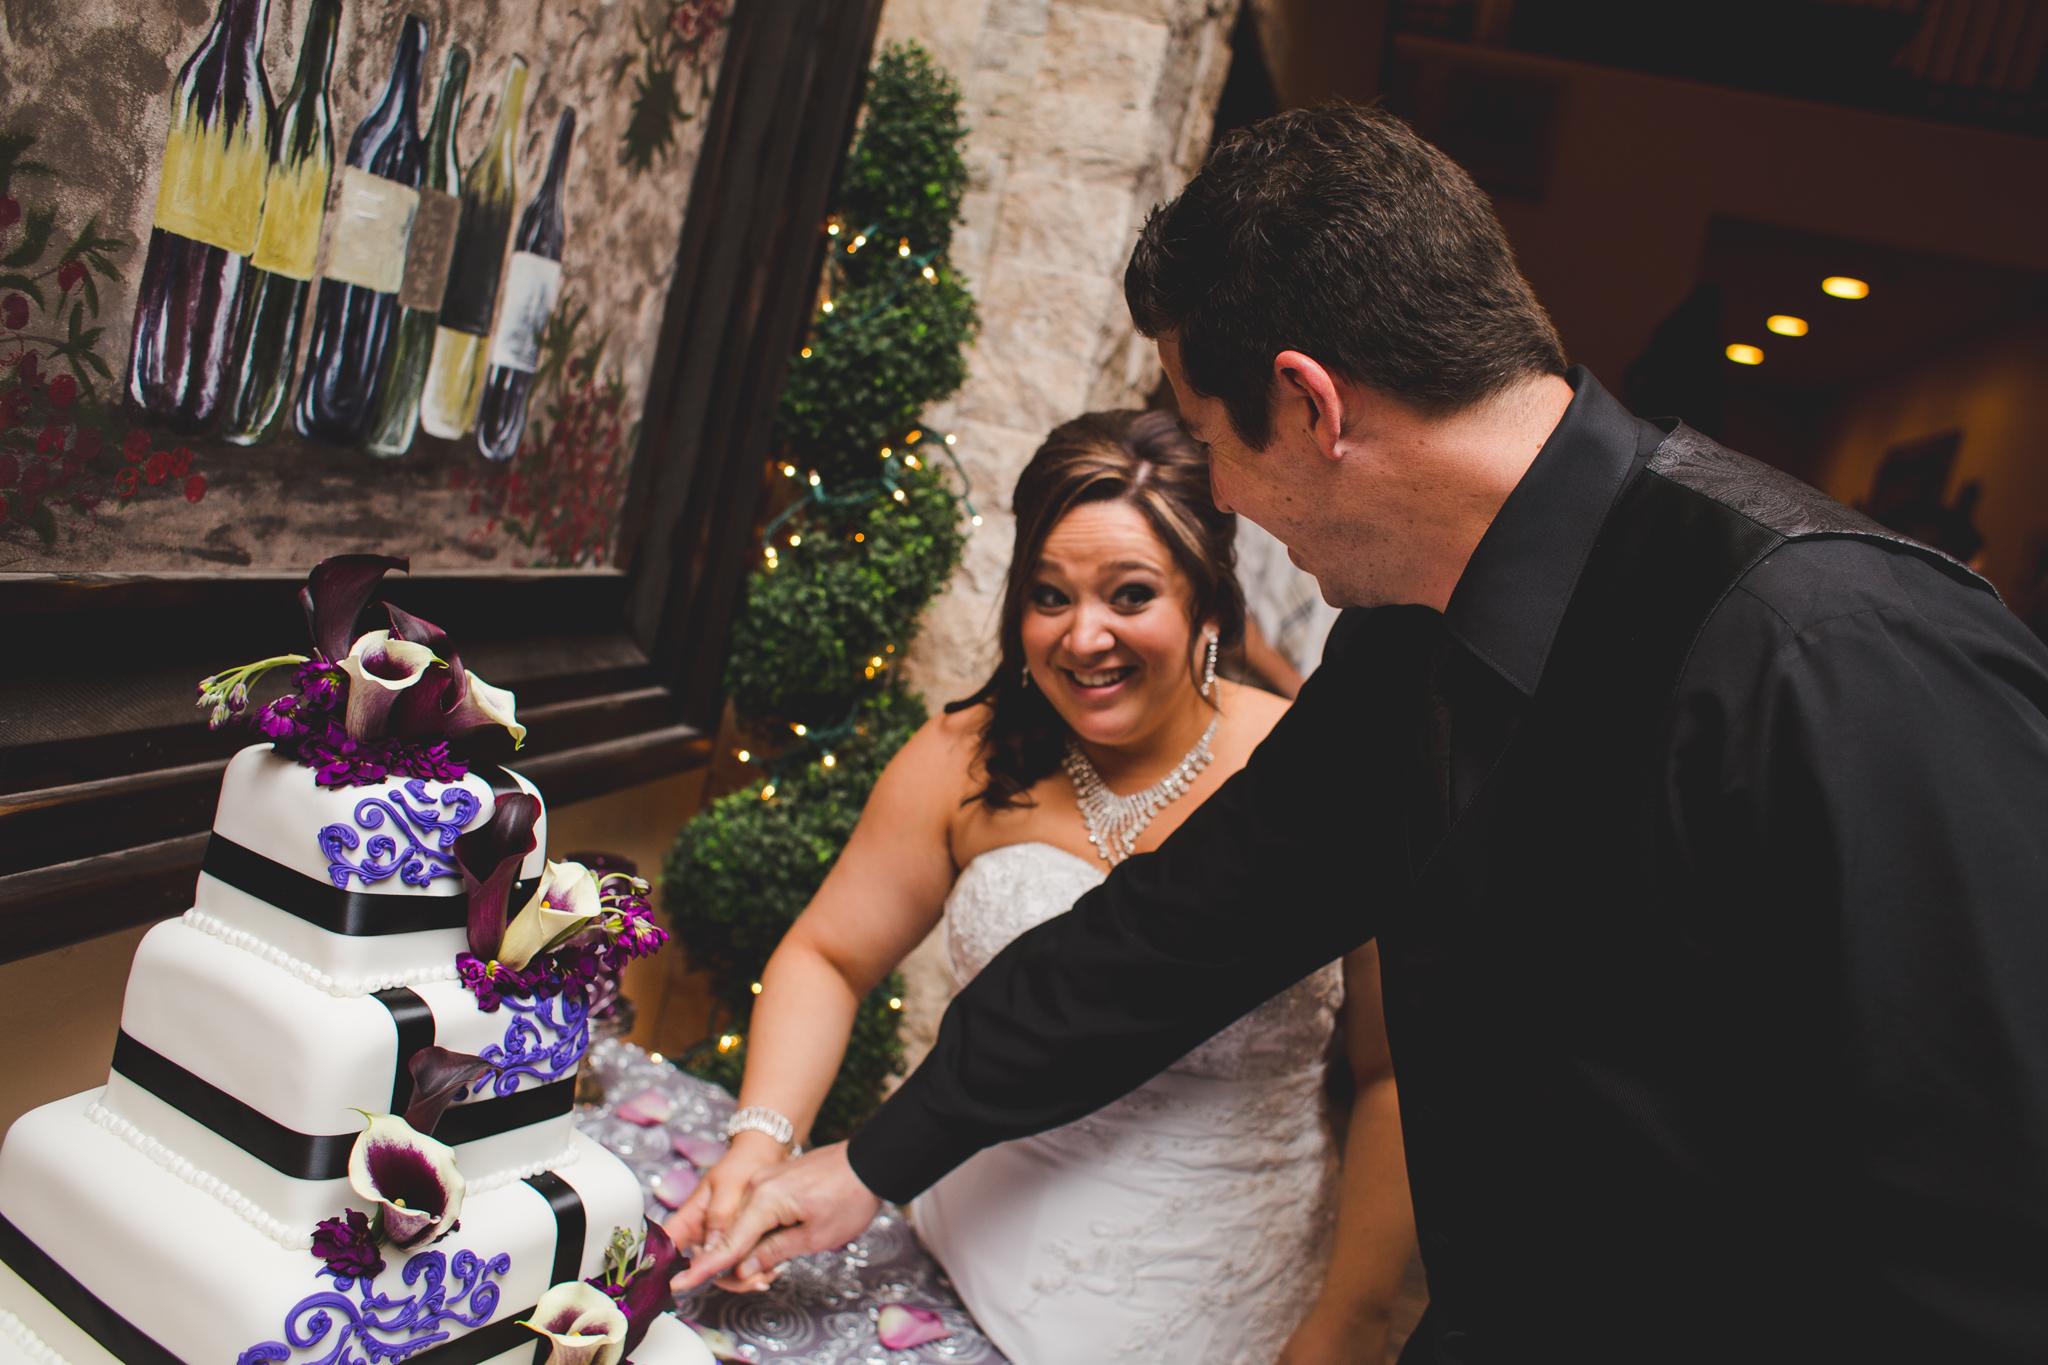 bride groom cutting cake